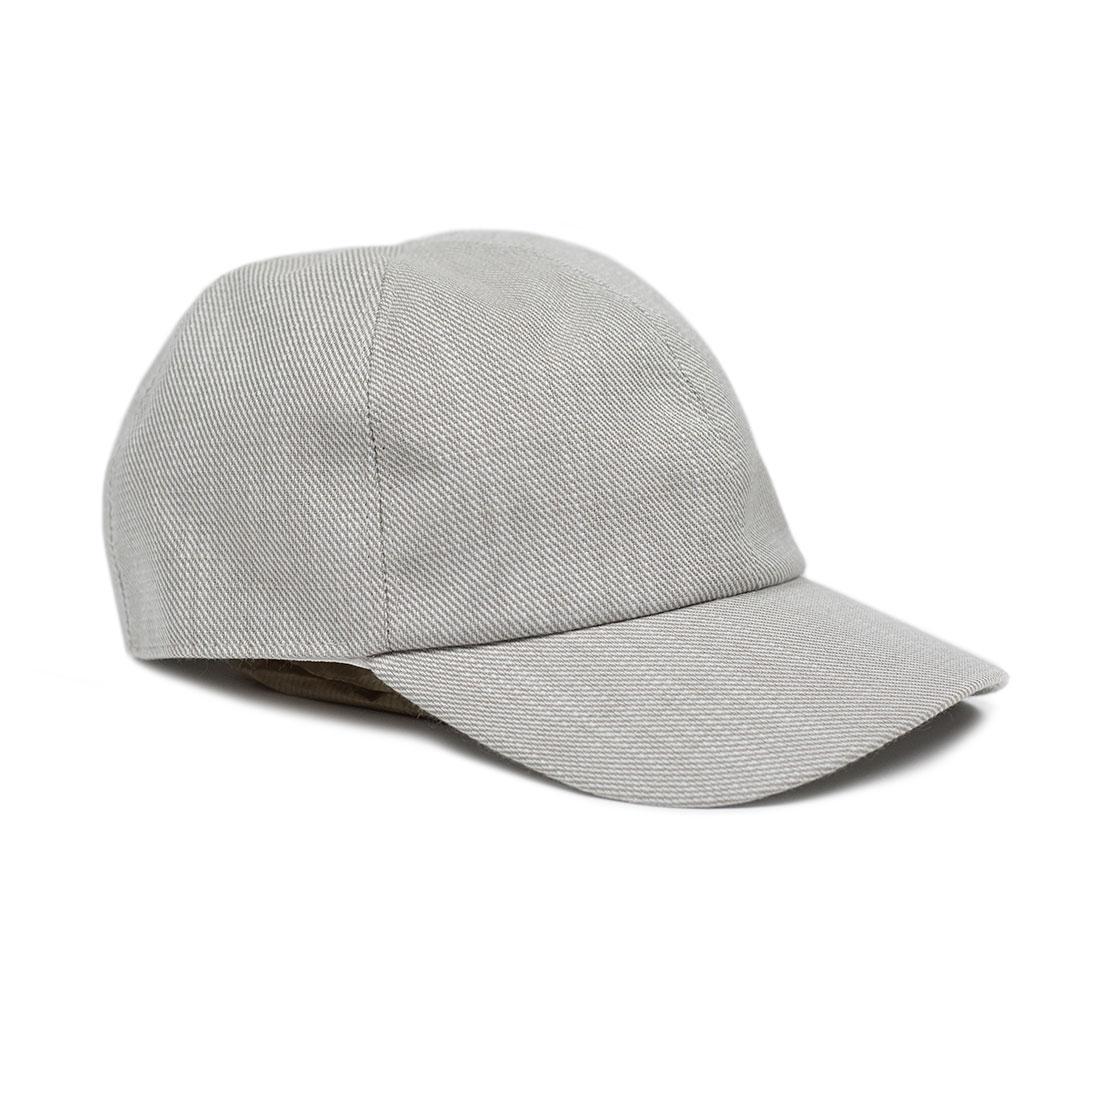 Stephan Schneider Spring Summer 2021 SS21 Cap Baseball Hat (11).jpg